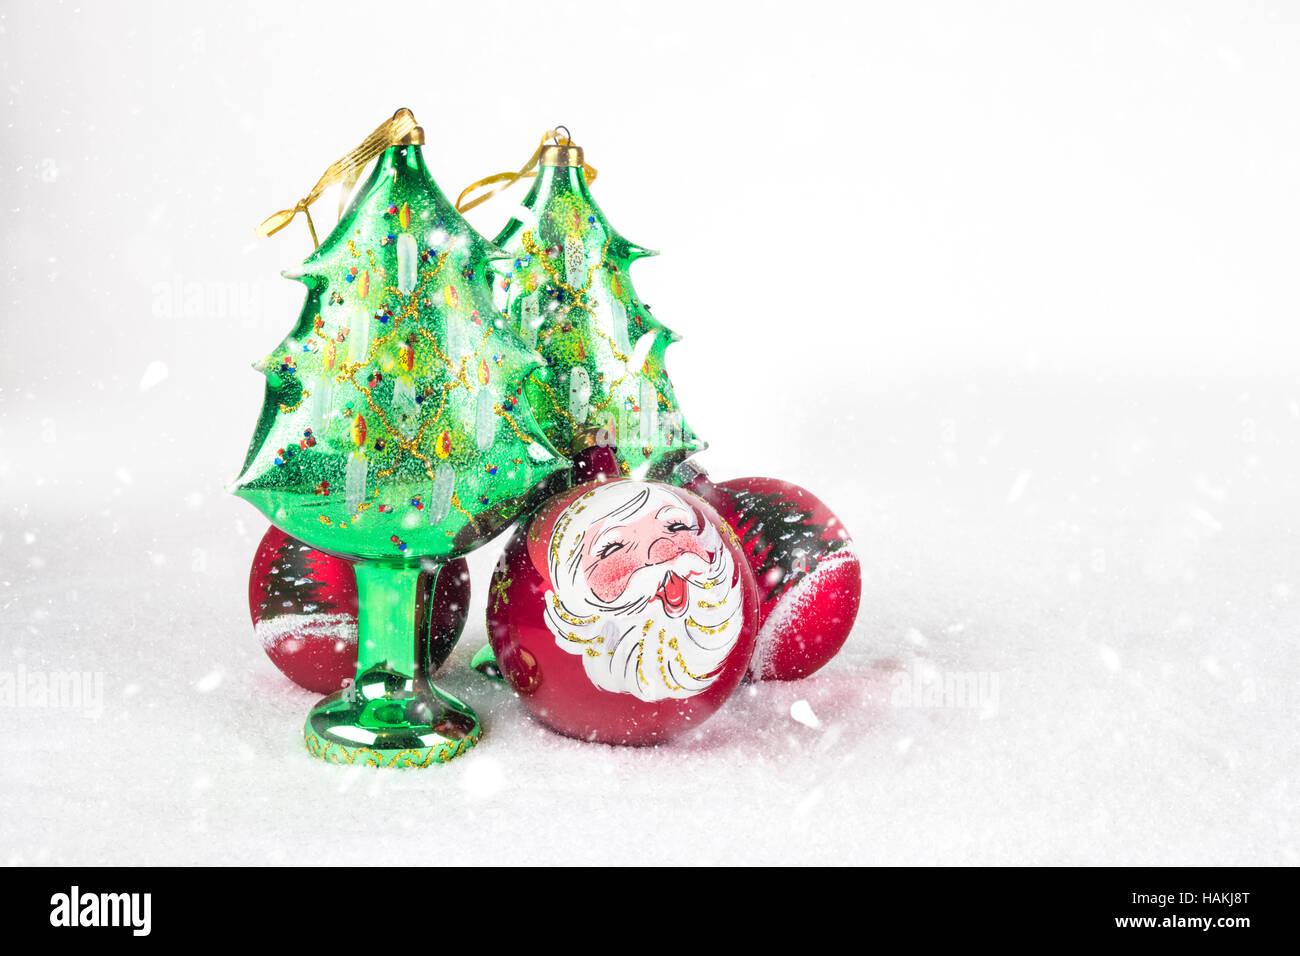 Blurry Santa Stock Photos & Blurry Santa Stock Images - Alamy